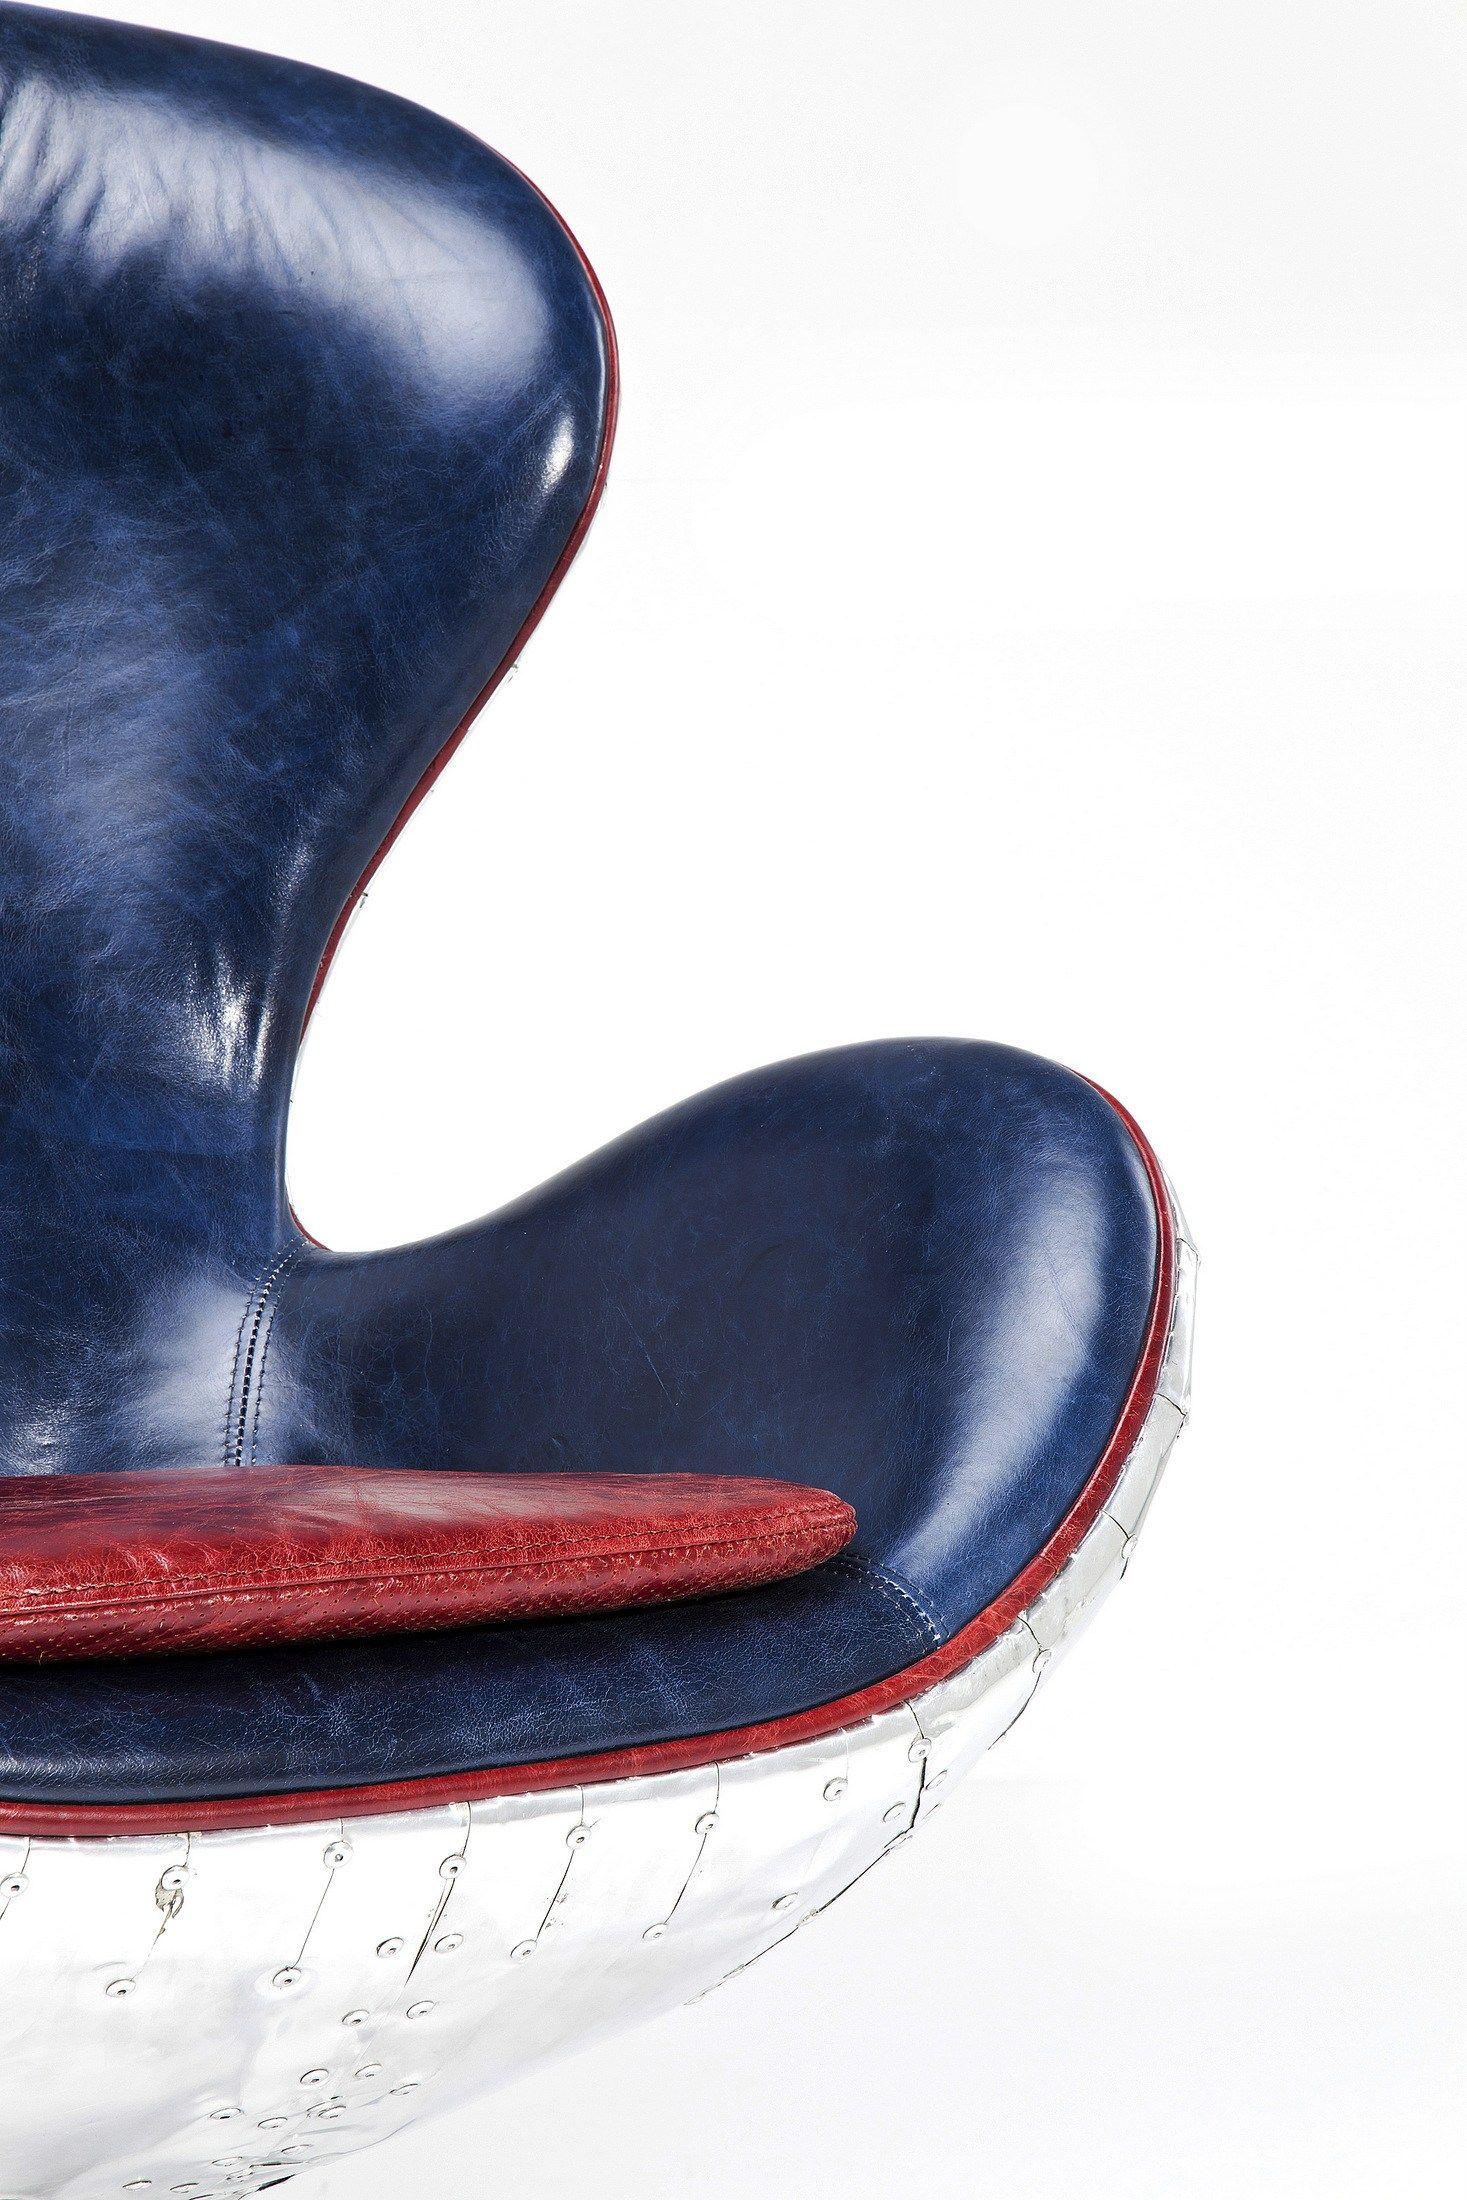 Swivel Leather Armchair Soho Big Boss By Kare Design